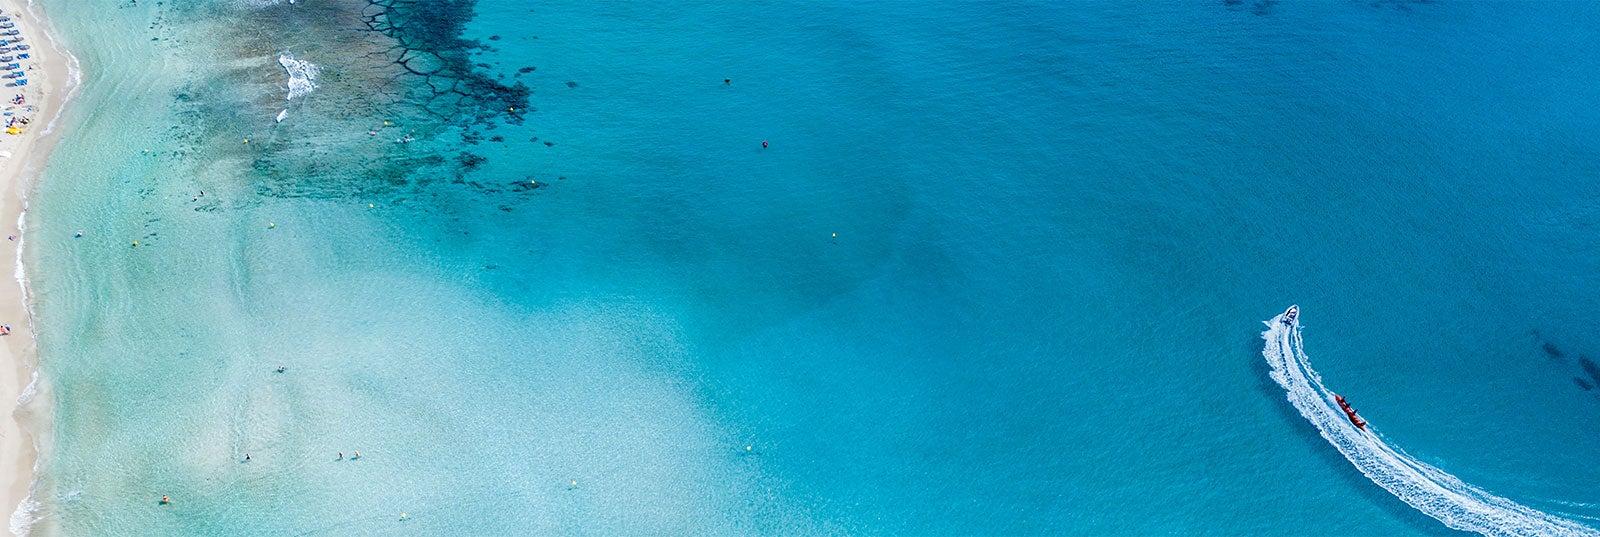 Guía turística de Menorca